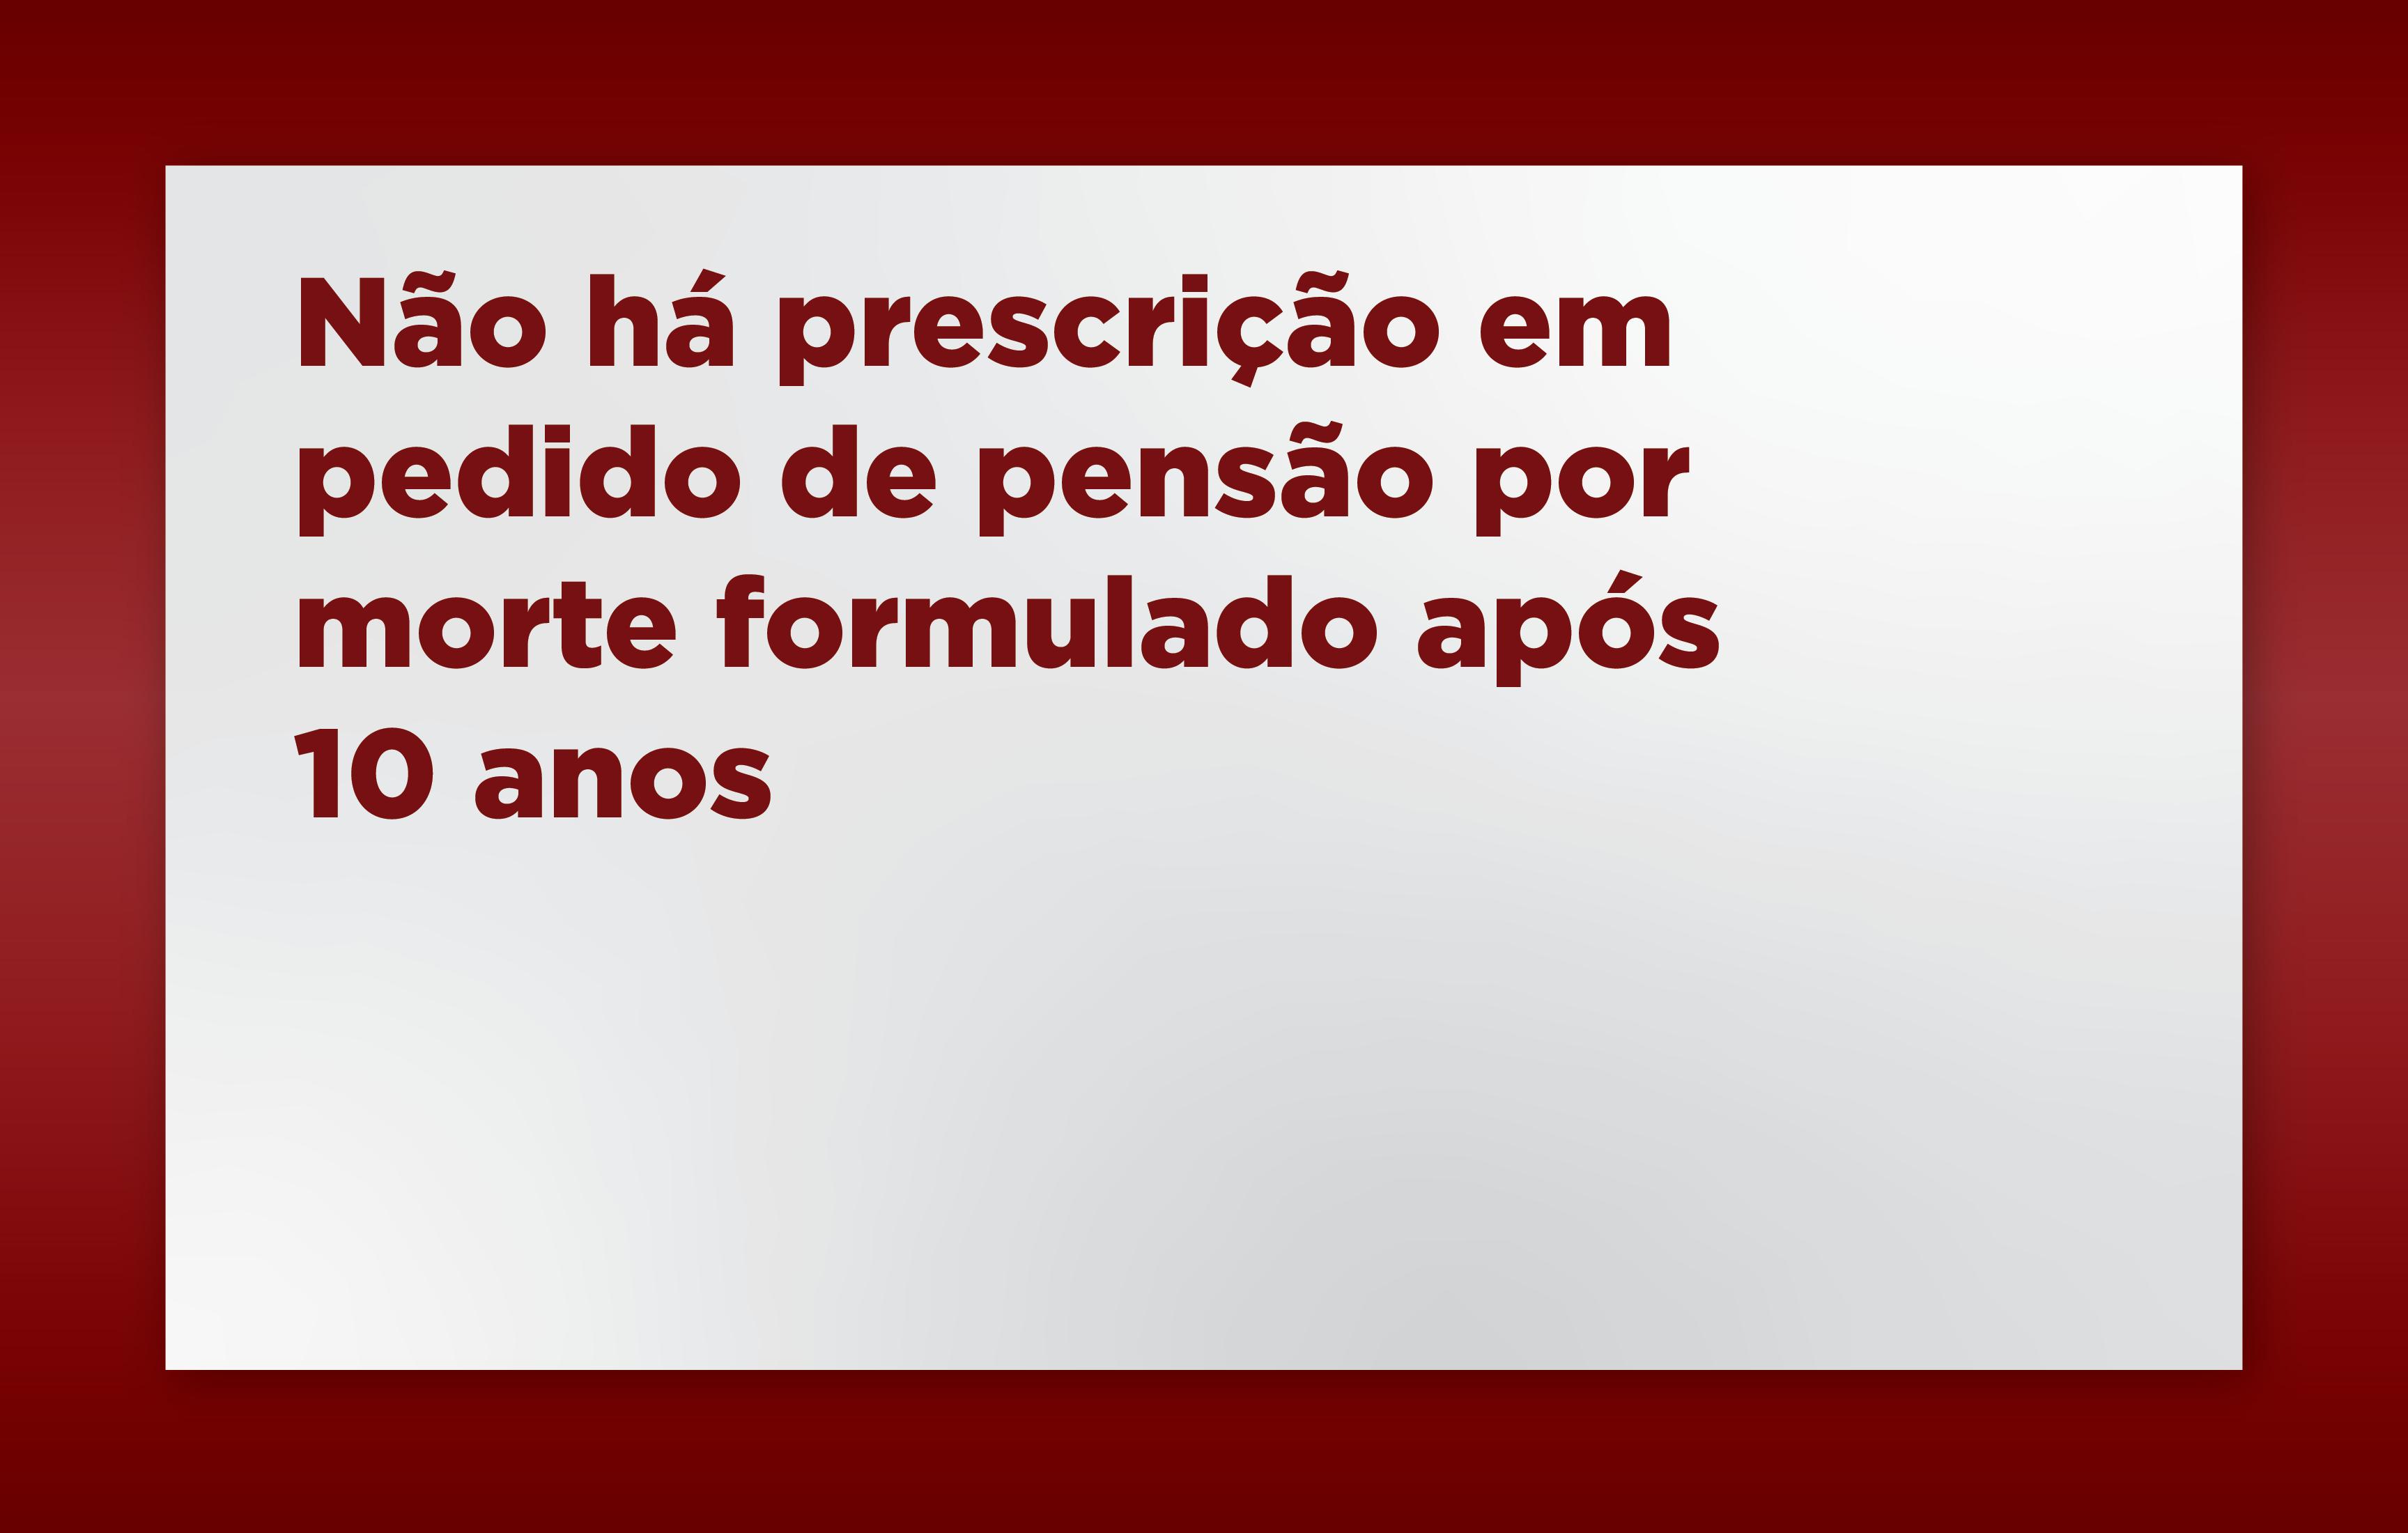 Blog_Prescricao@4x